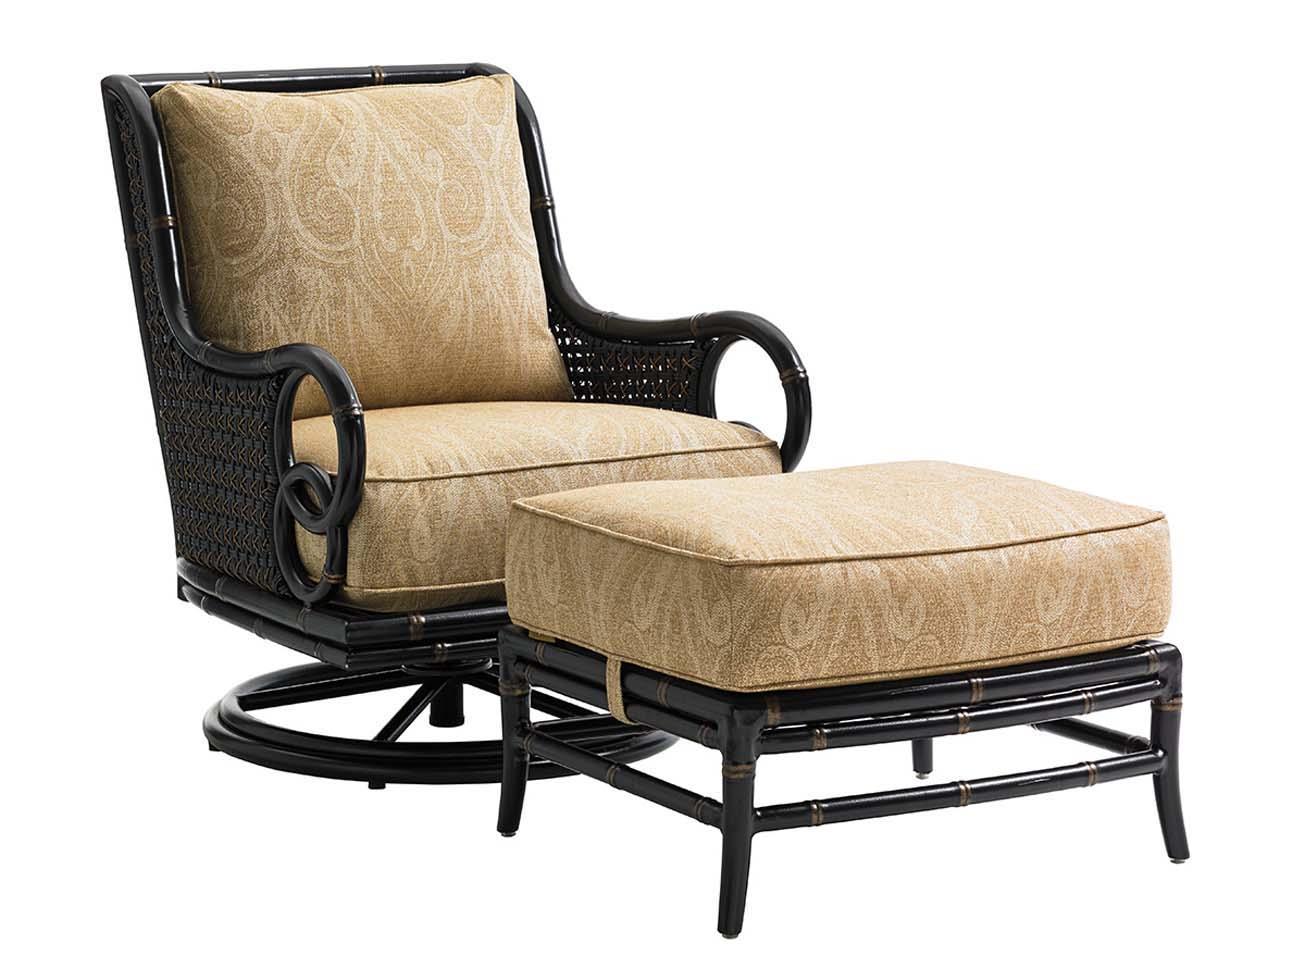 Swivel Rocker Lounge Chair and Ottoman